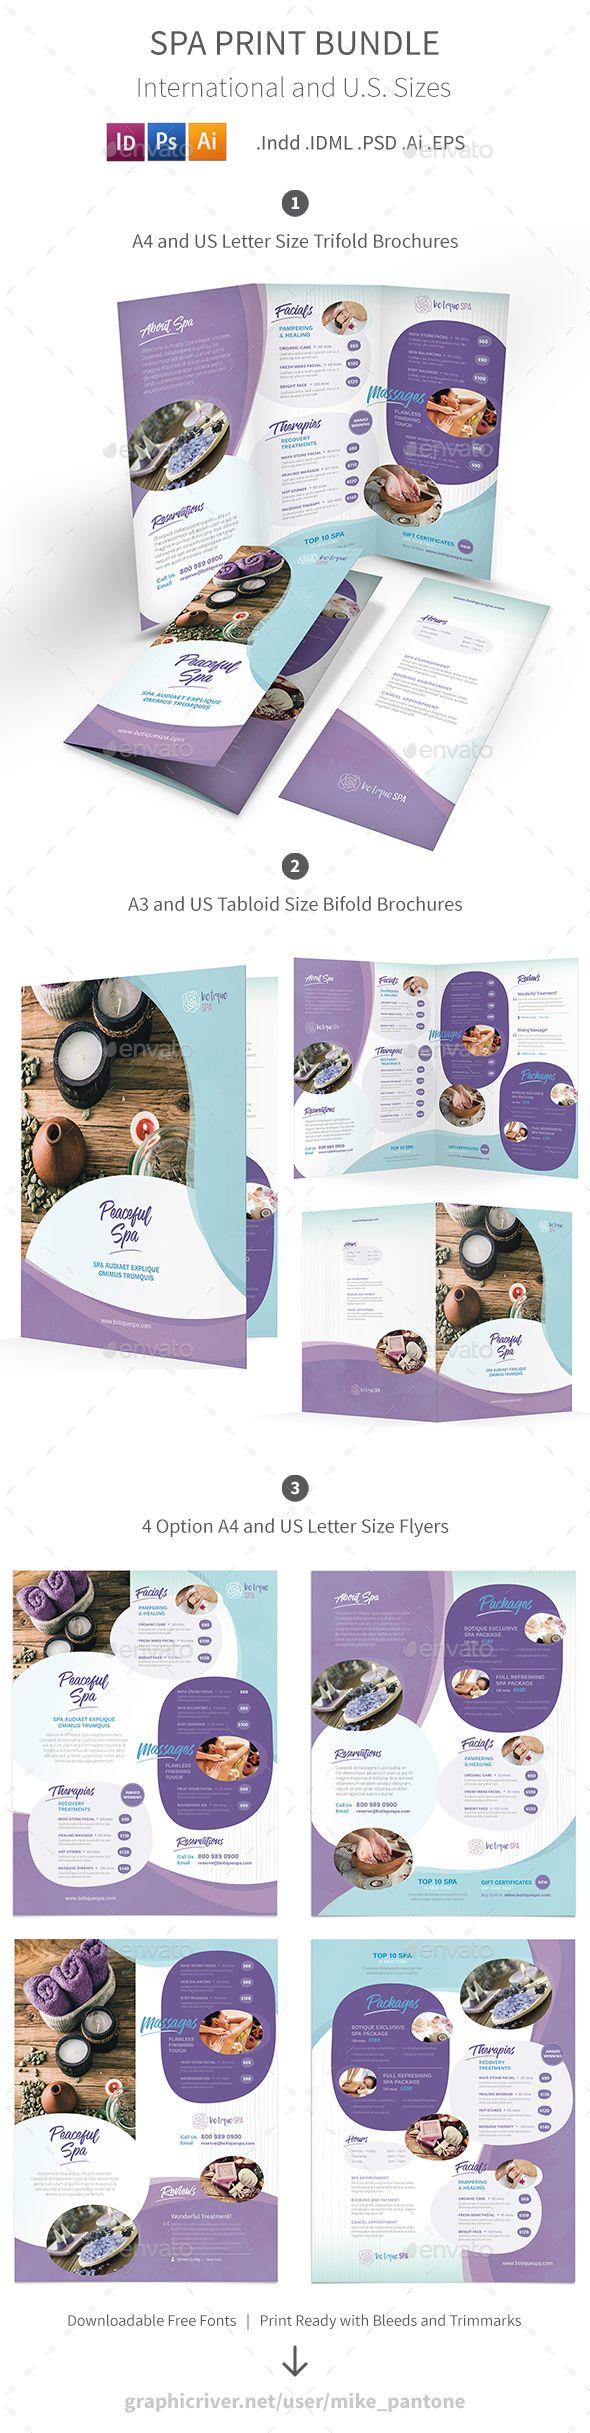 Spa Print Bundle 8   Folletos, Folleto tríptico y Tríptico